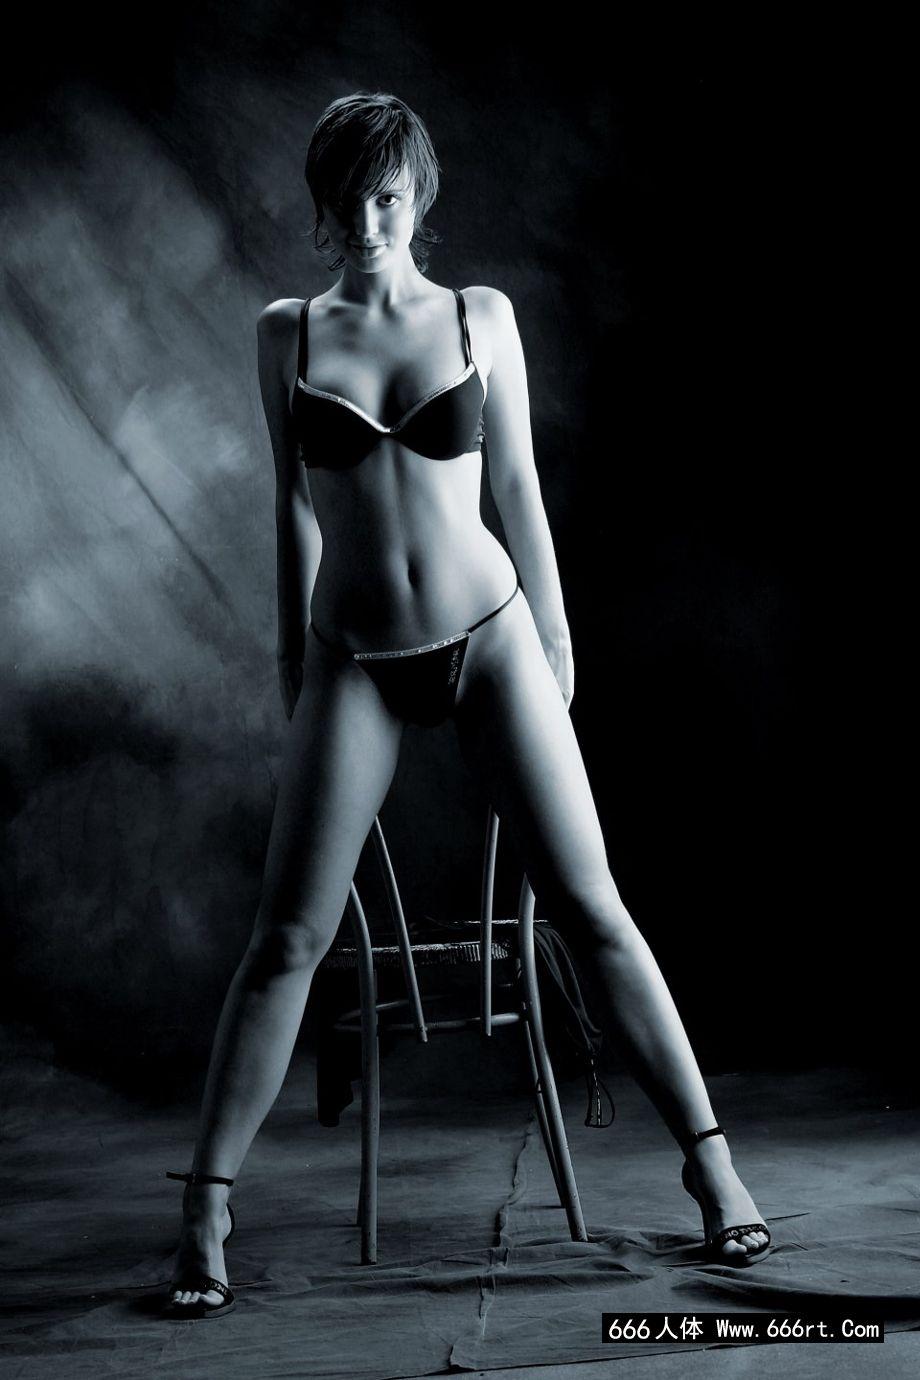 WWW.人体艺术汤,大师级图片师为金伯利拍摄的人体写照